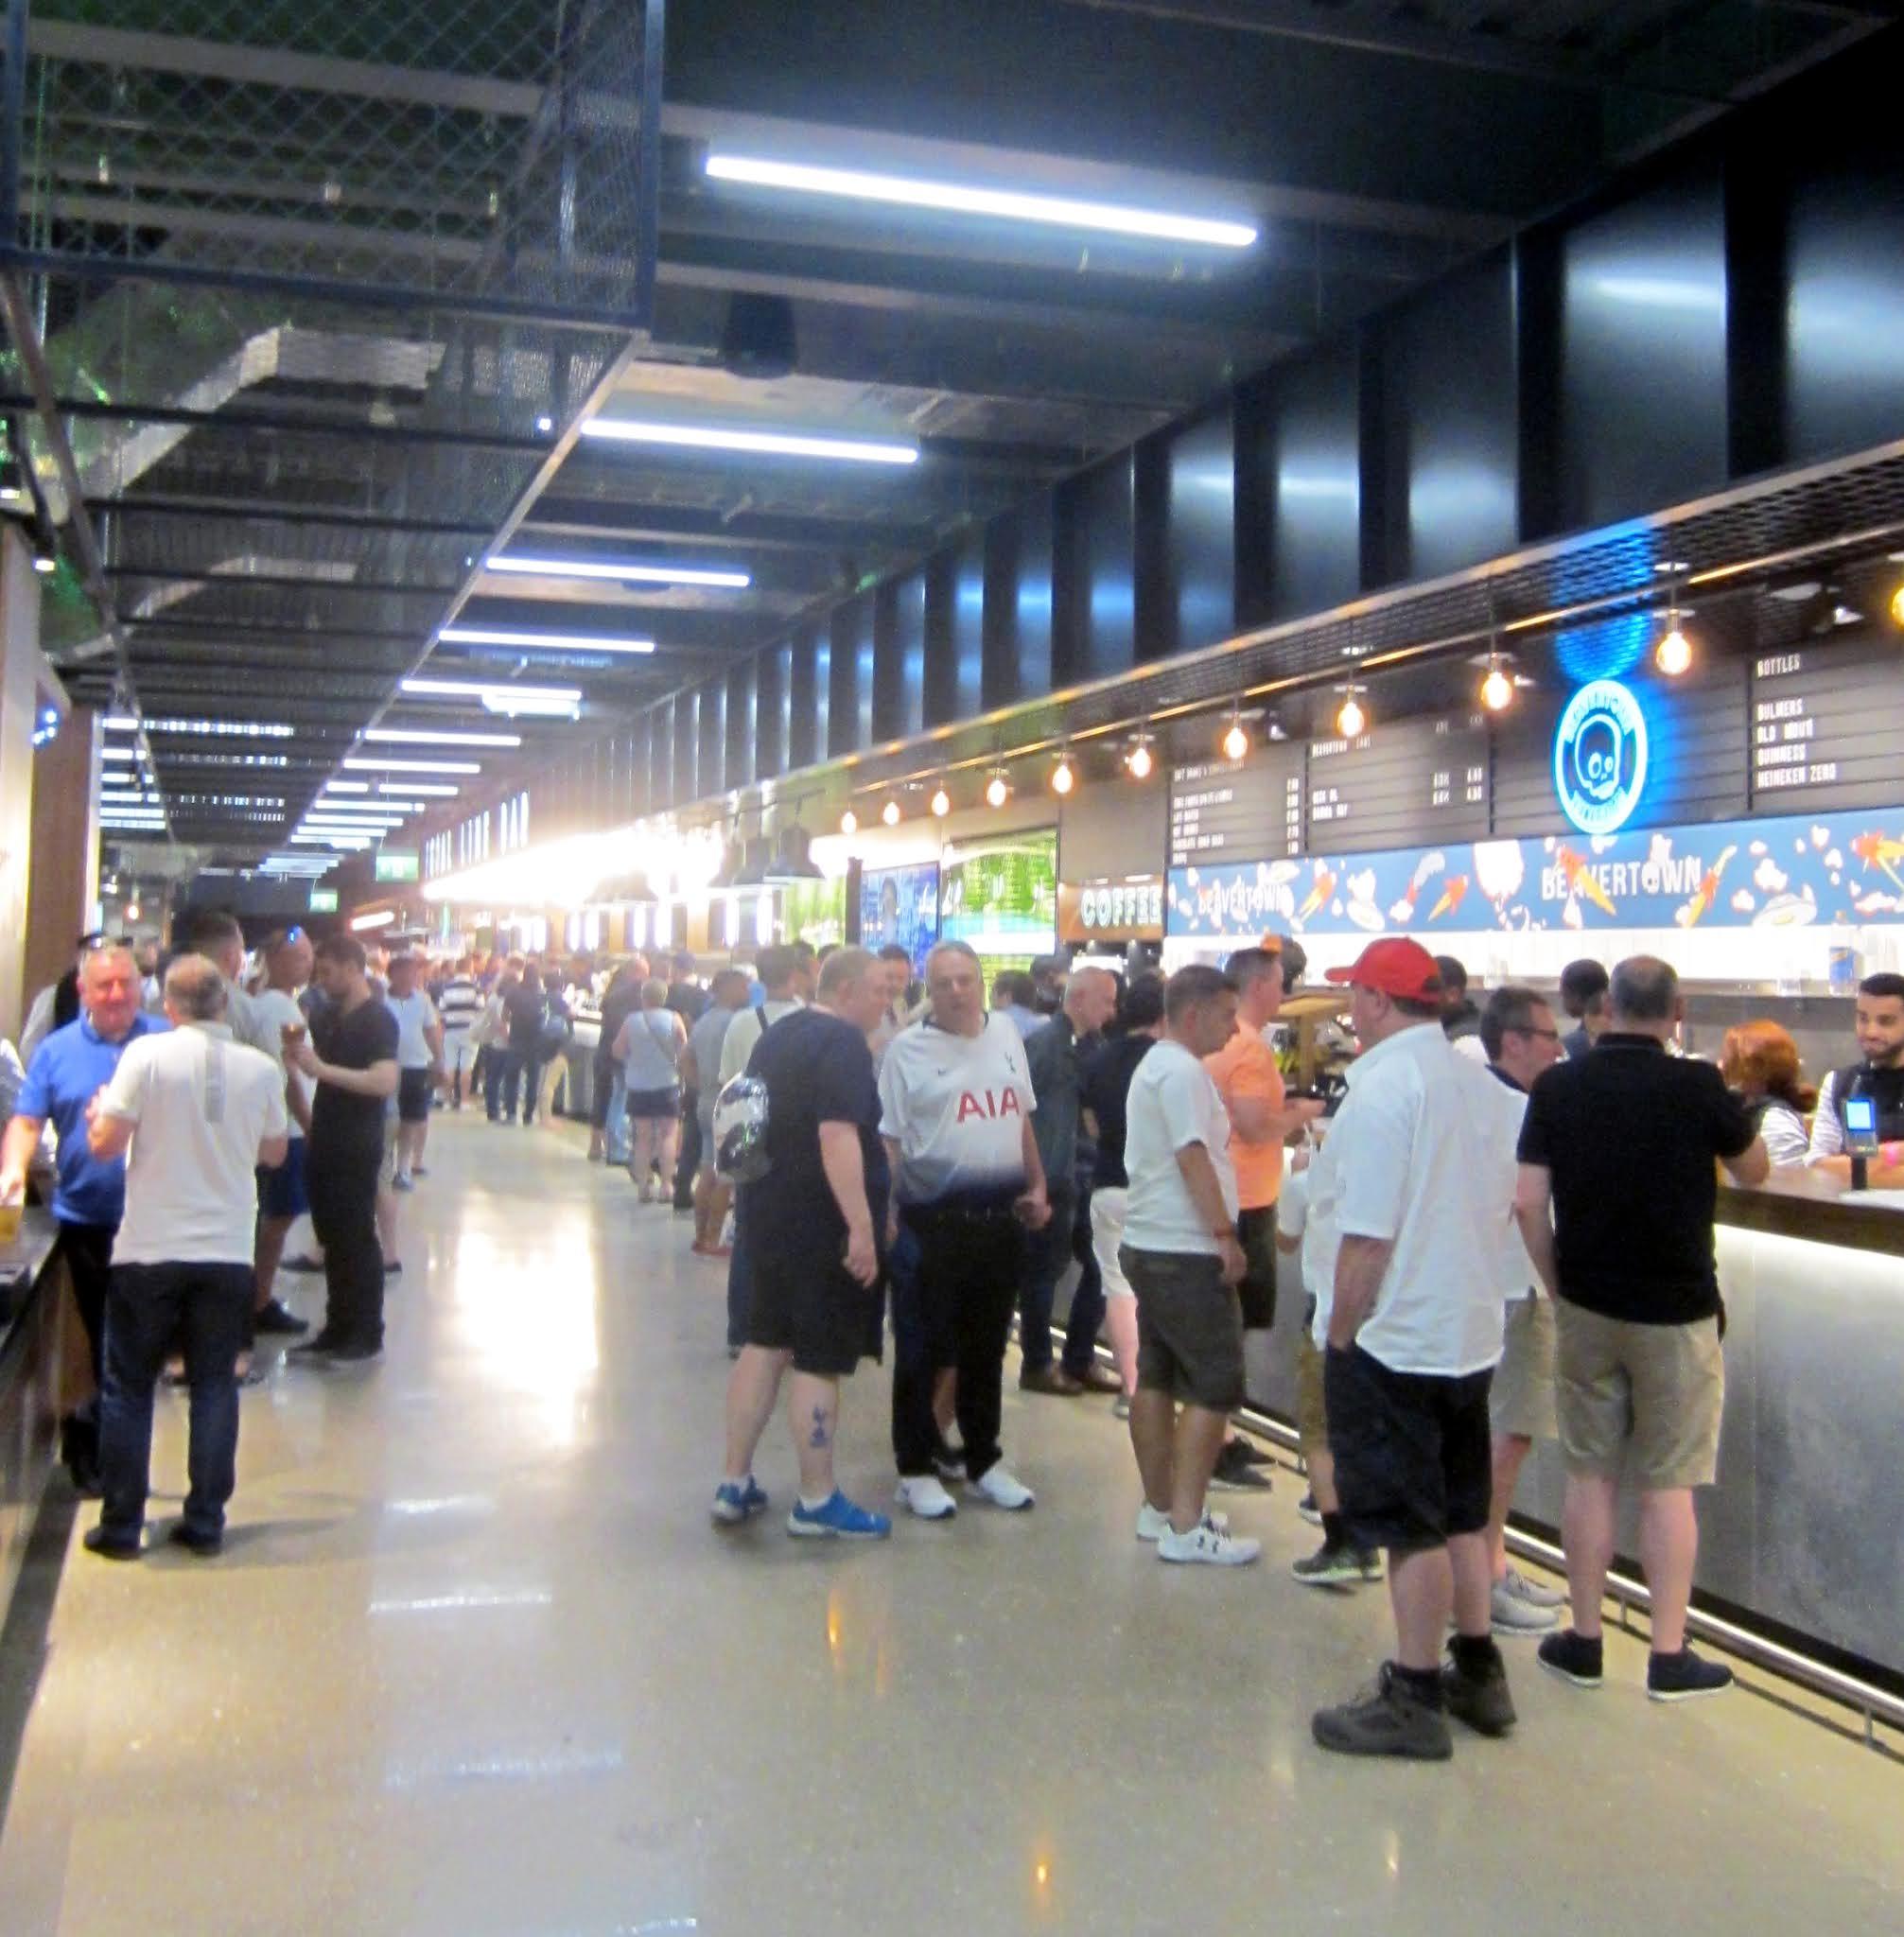 Goal Line Bar at Tottenham Hotspur Stadium